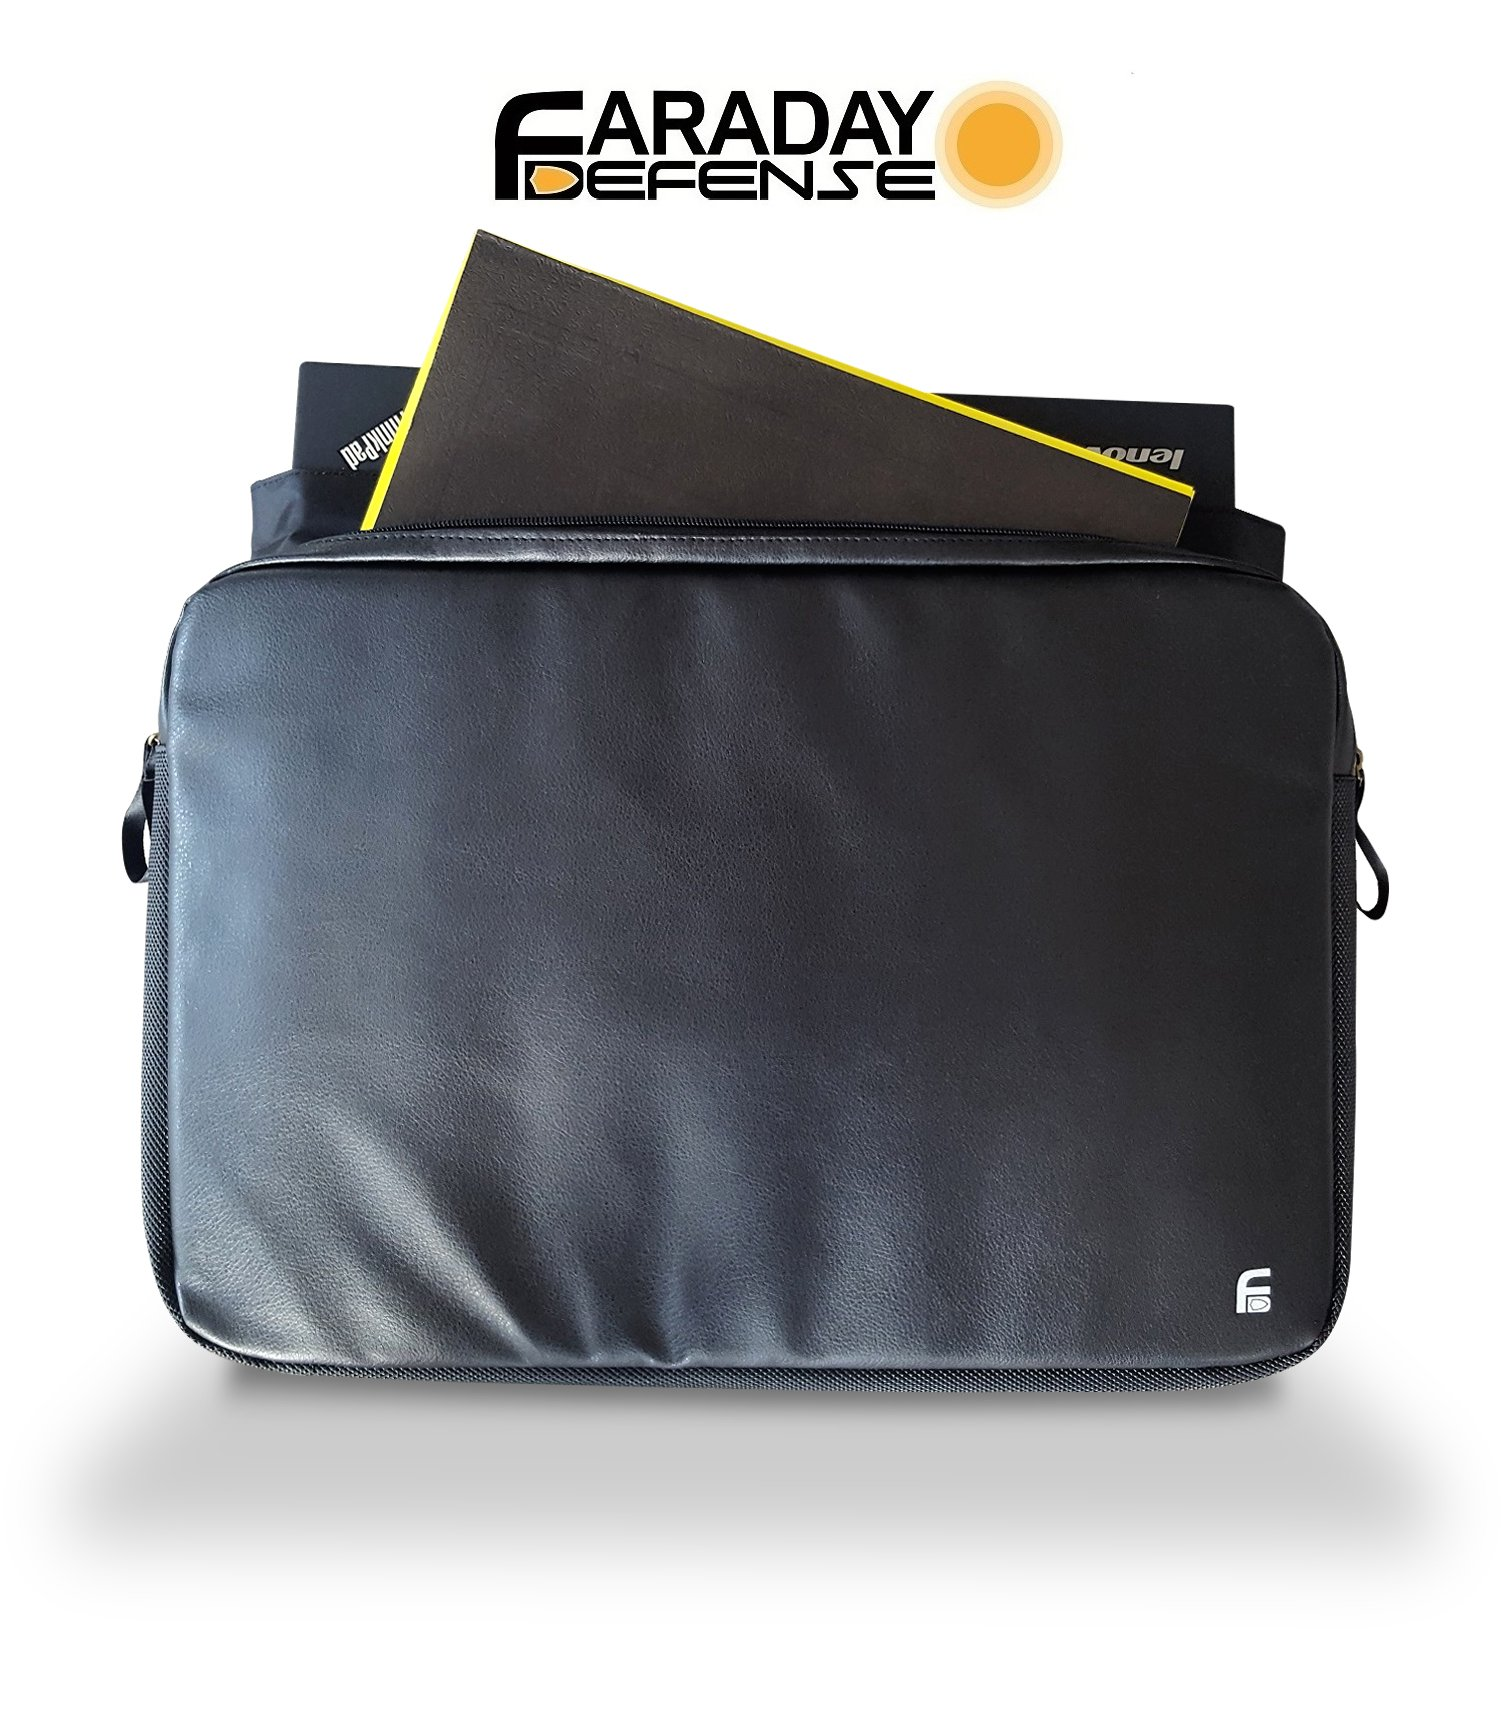 Laptop X-large Faraday Bag 15.6'' RFID Privacy Protection Anti-tracking Anti-spying EMP GPS Rfid Signal Blocking Bag